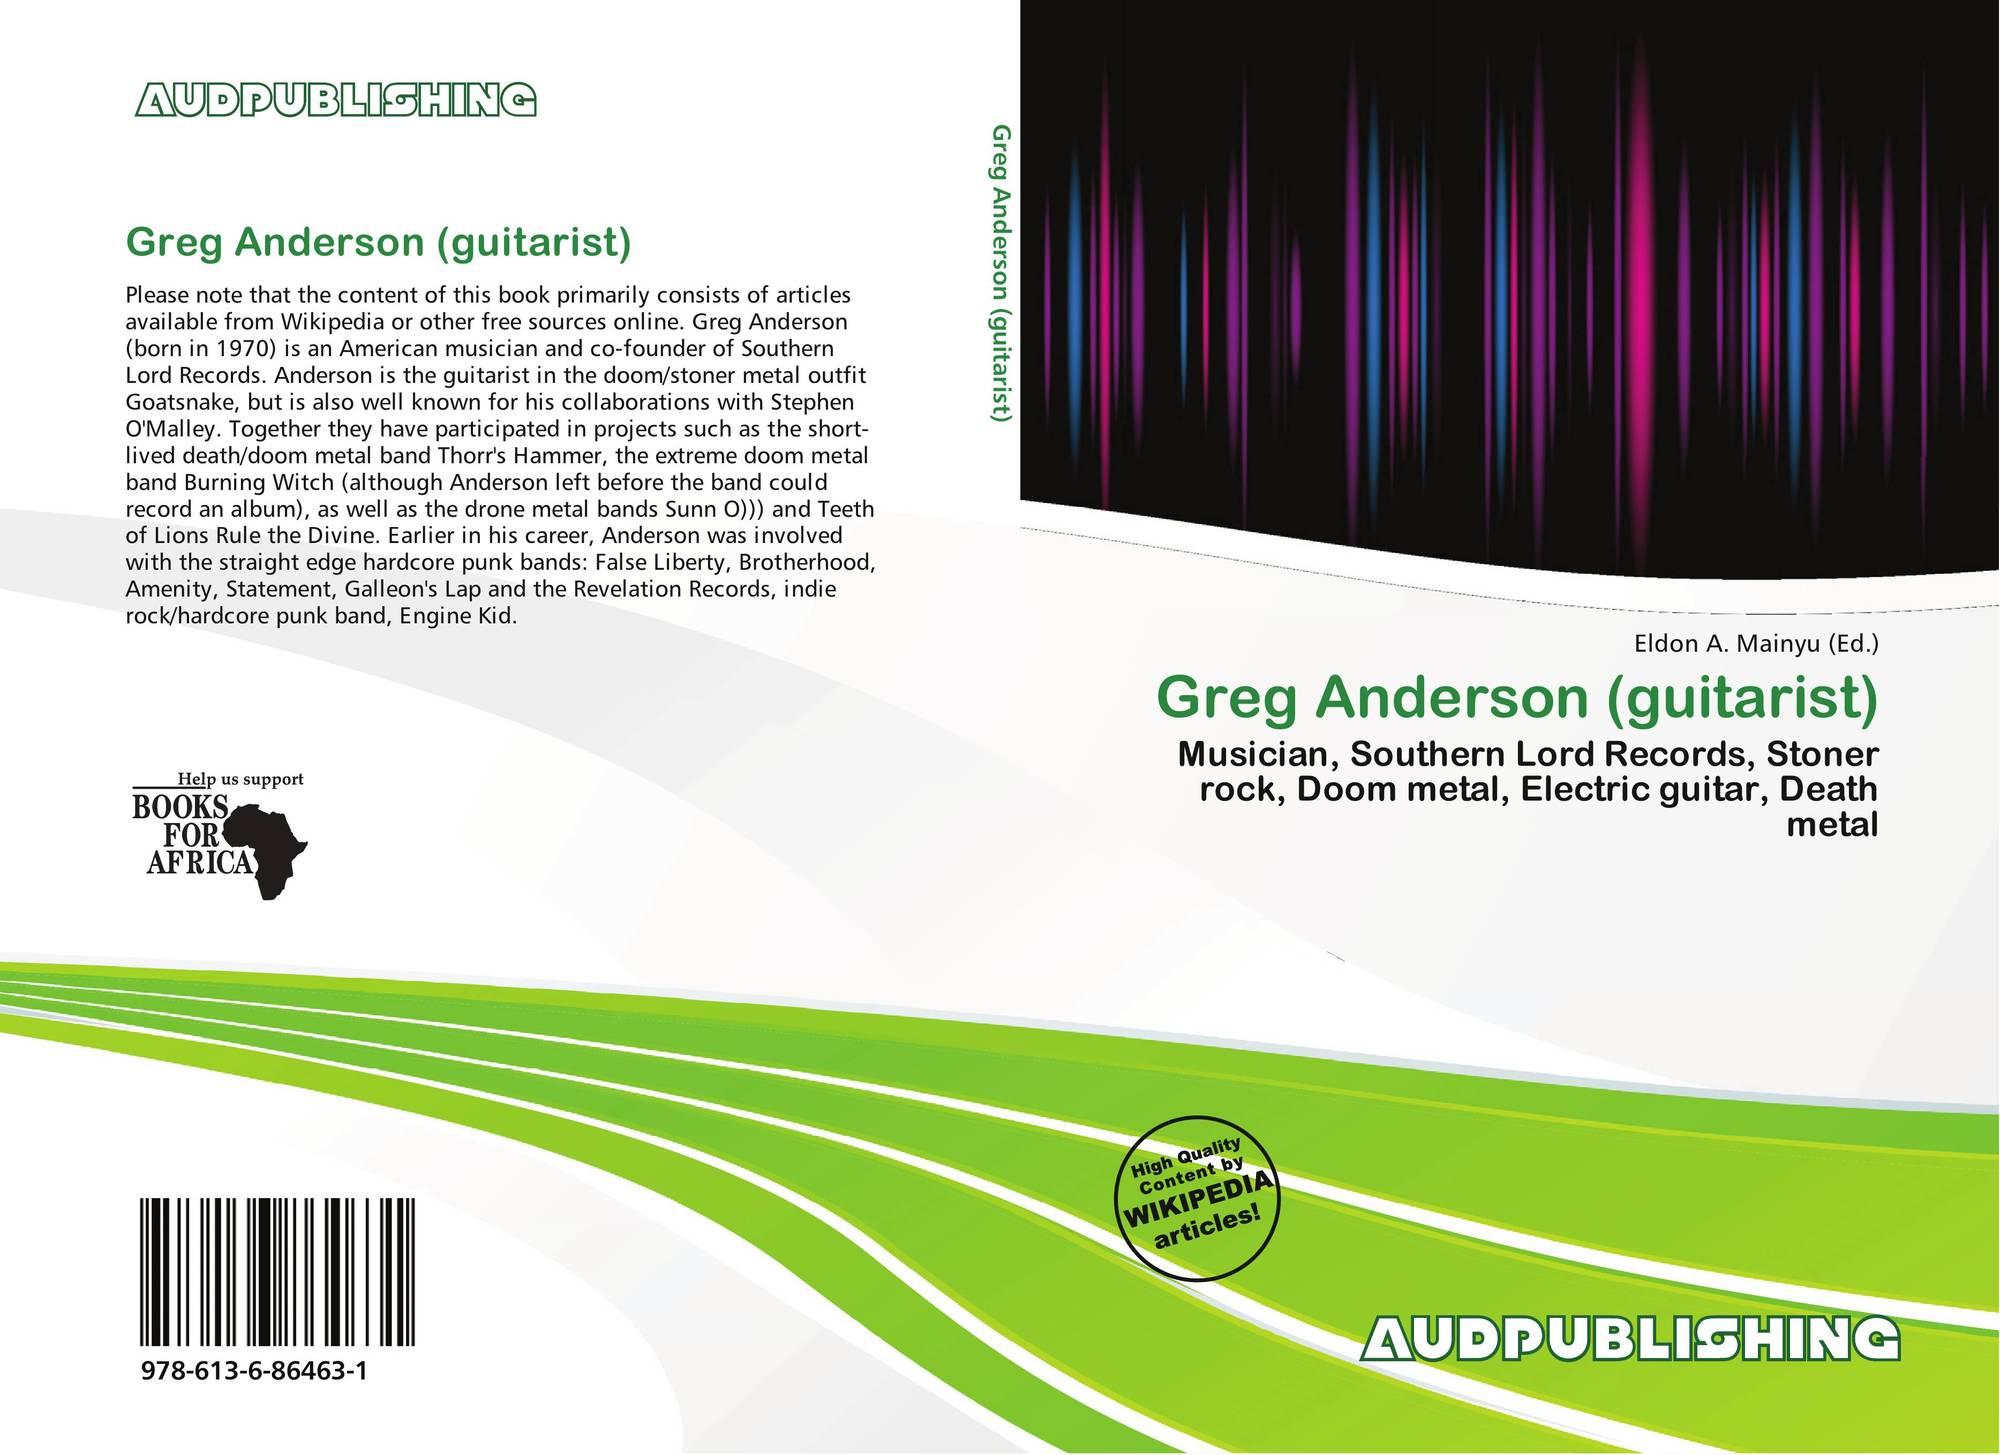 Greg Anderson (guitarist), 978-613-6-86463-1, 6136864630